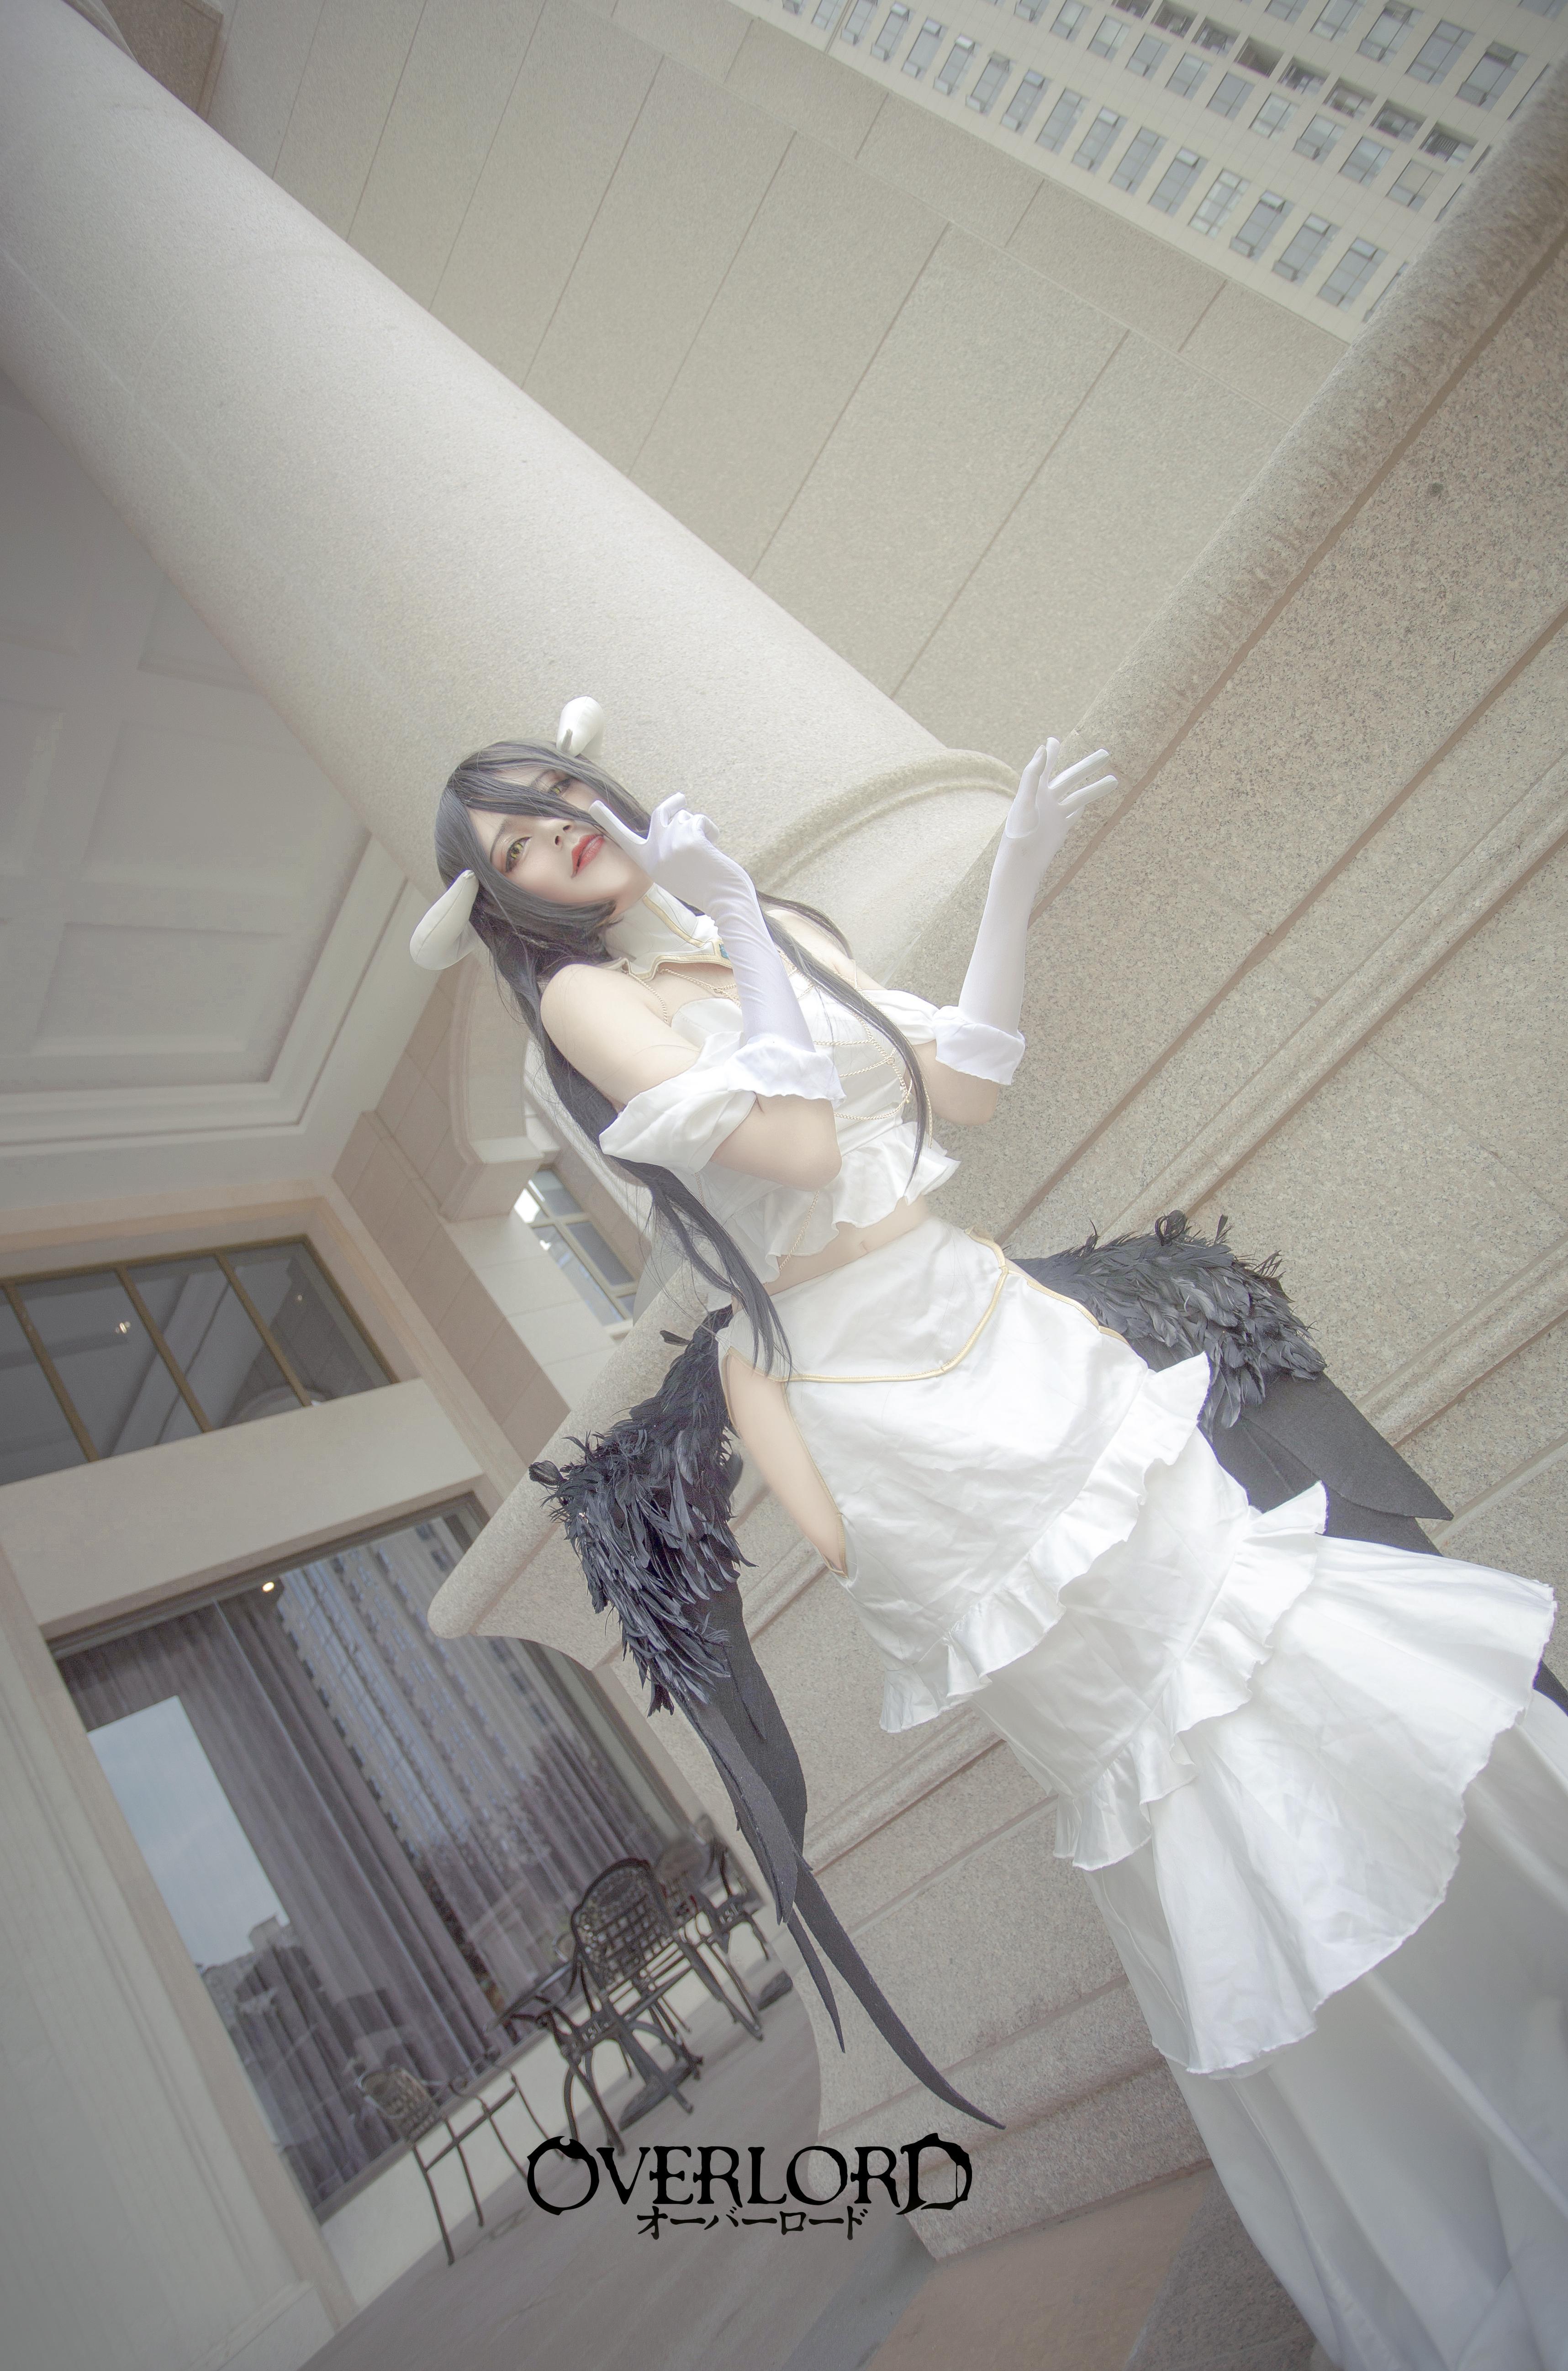 《OVERLORD》雅儿贝德cosplay【CN:百里.富贵】-第3张